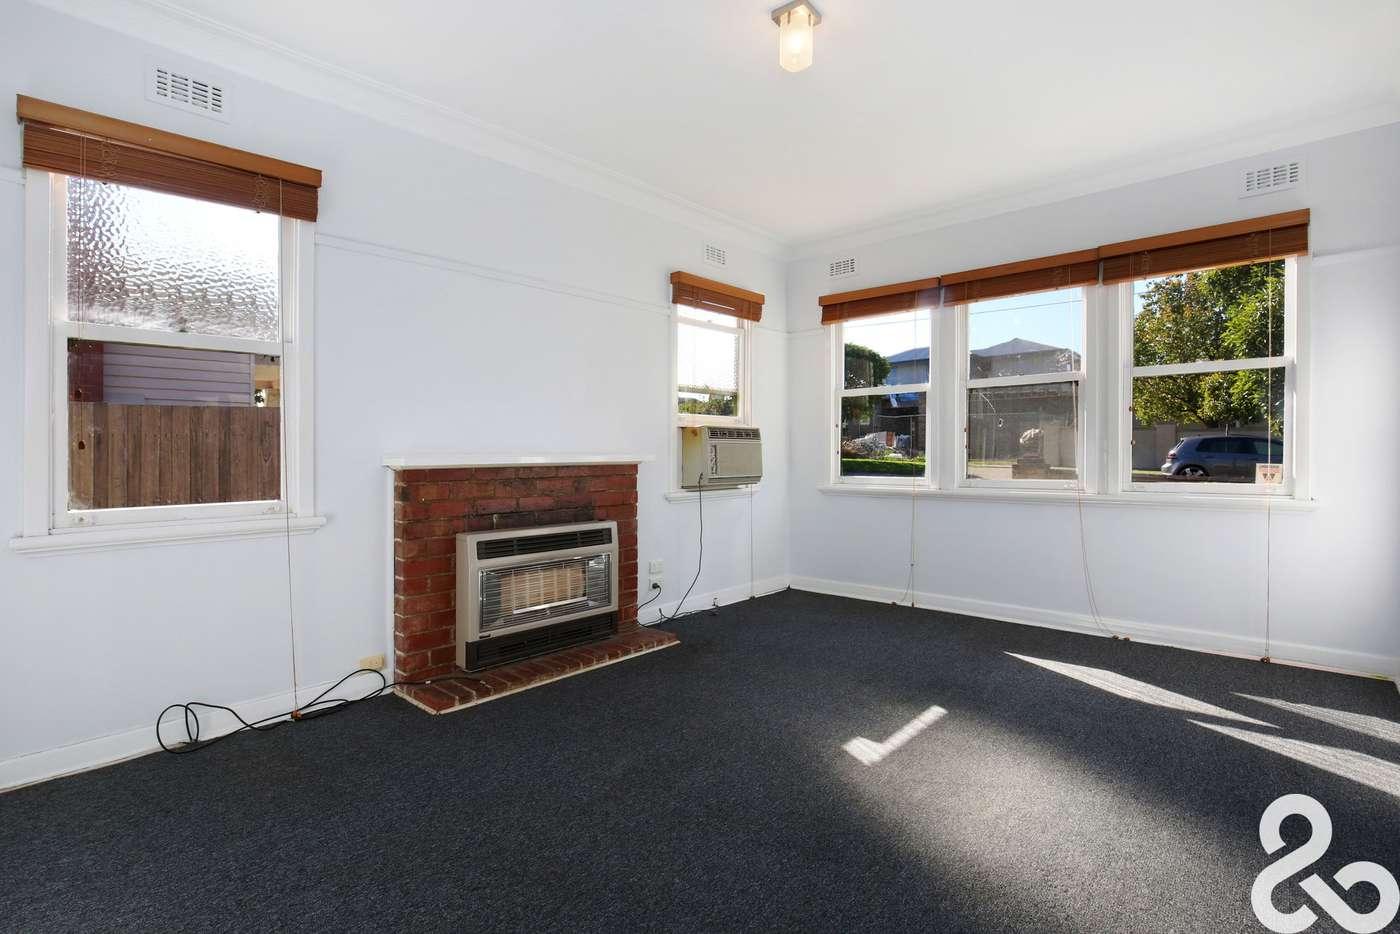 Main view of Homely house listing, 33 Gordon Grove, Preston VIC 3072